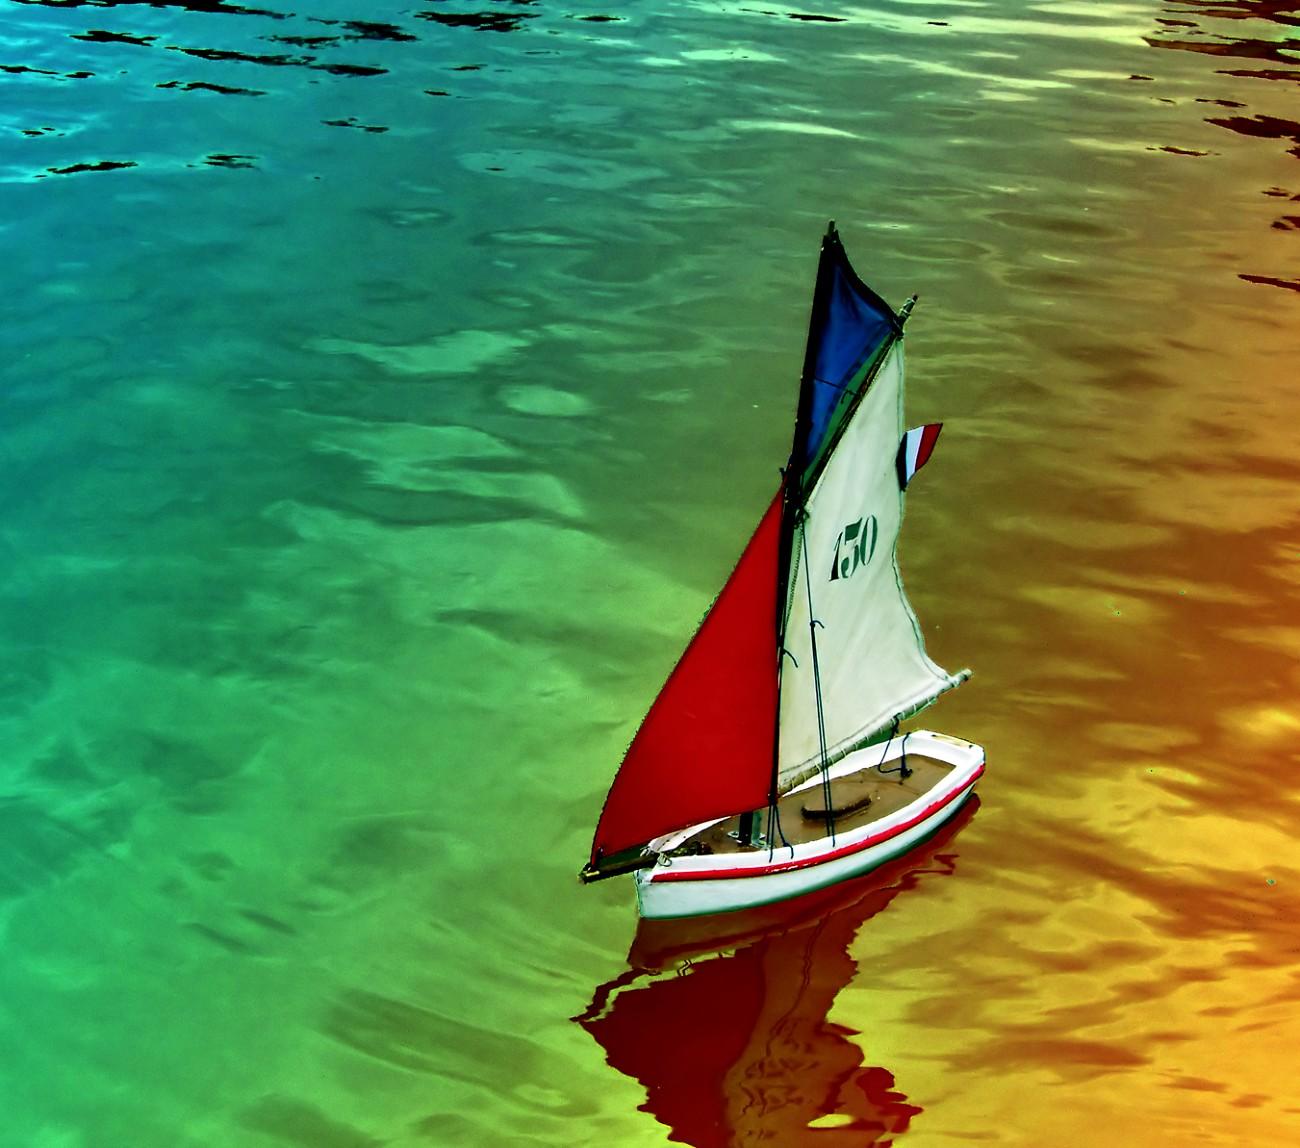 мы без вас словно лодка без весел словно яхта без паруса в шквал